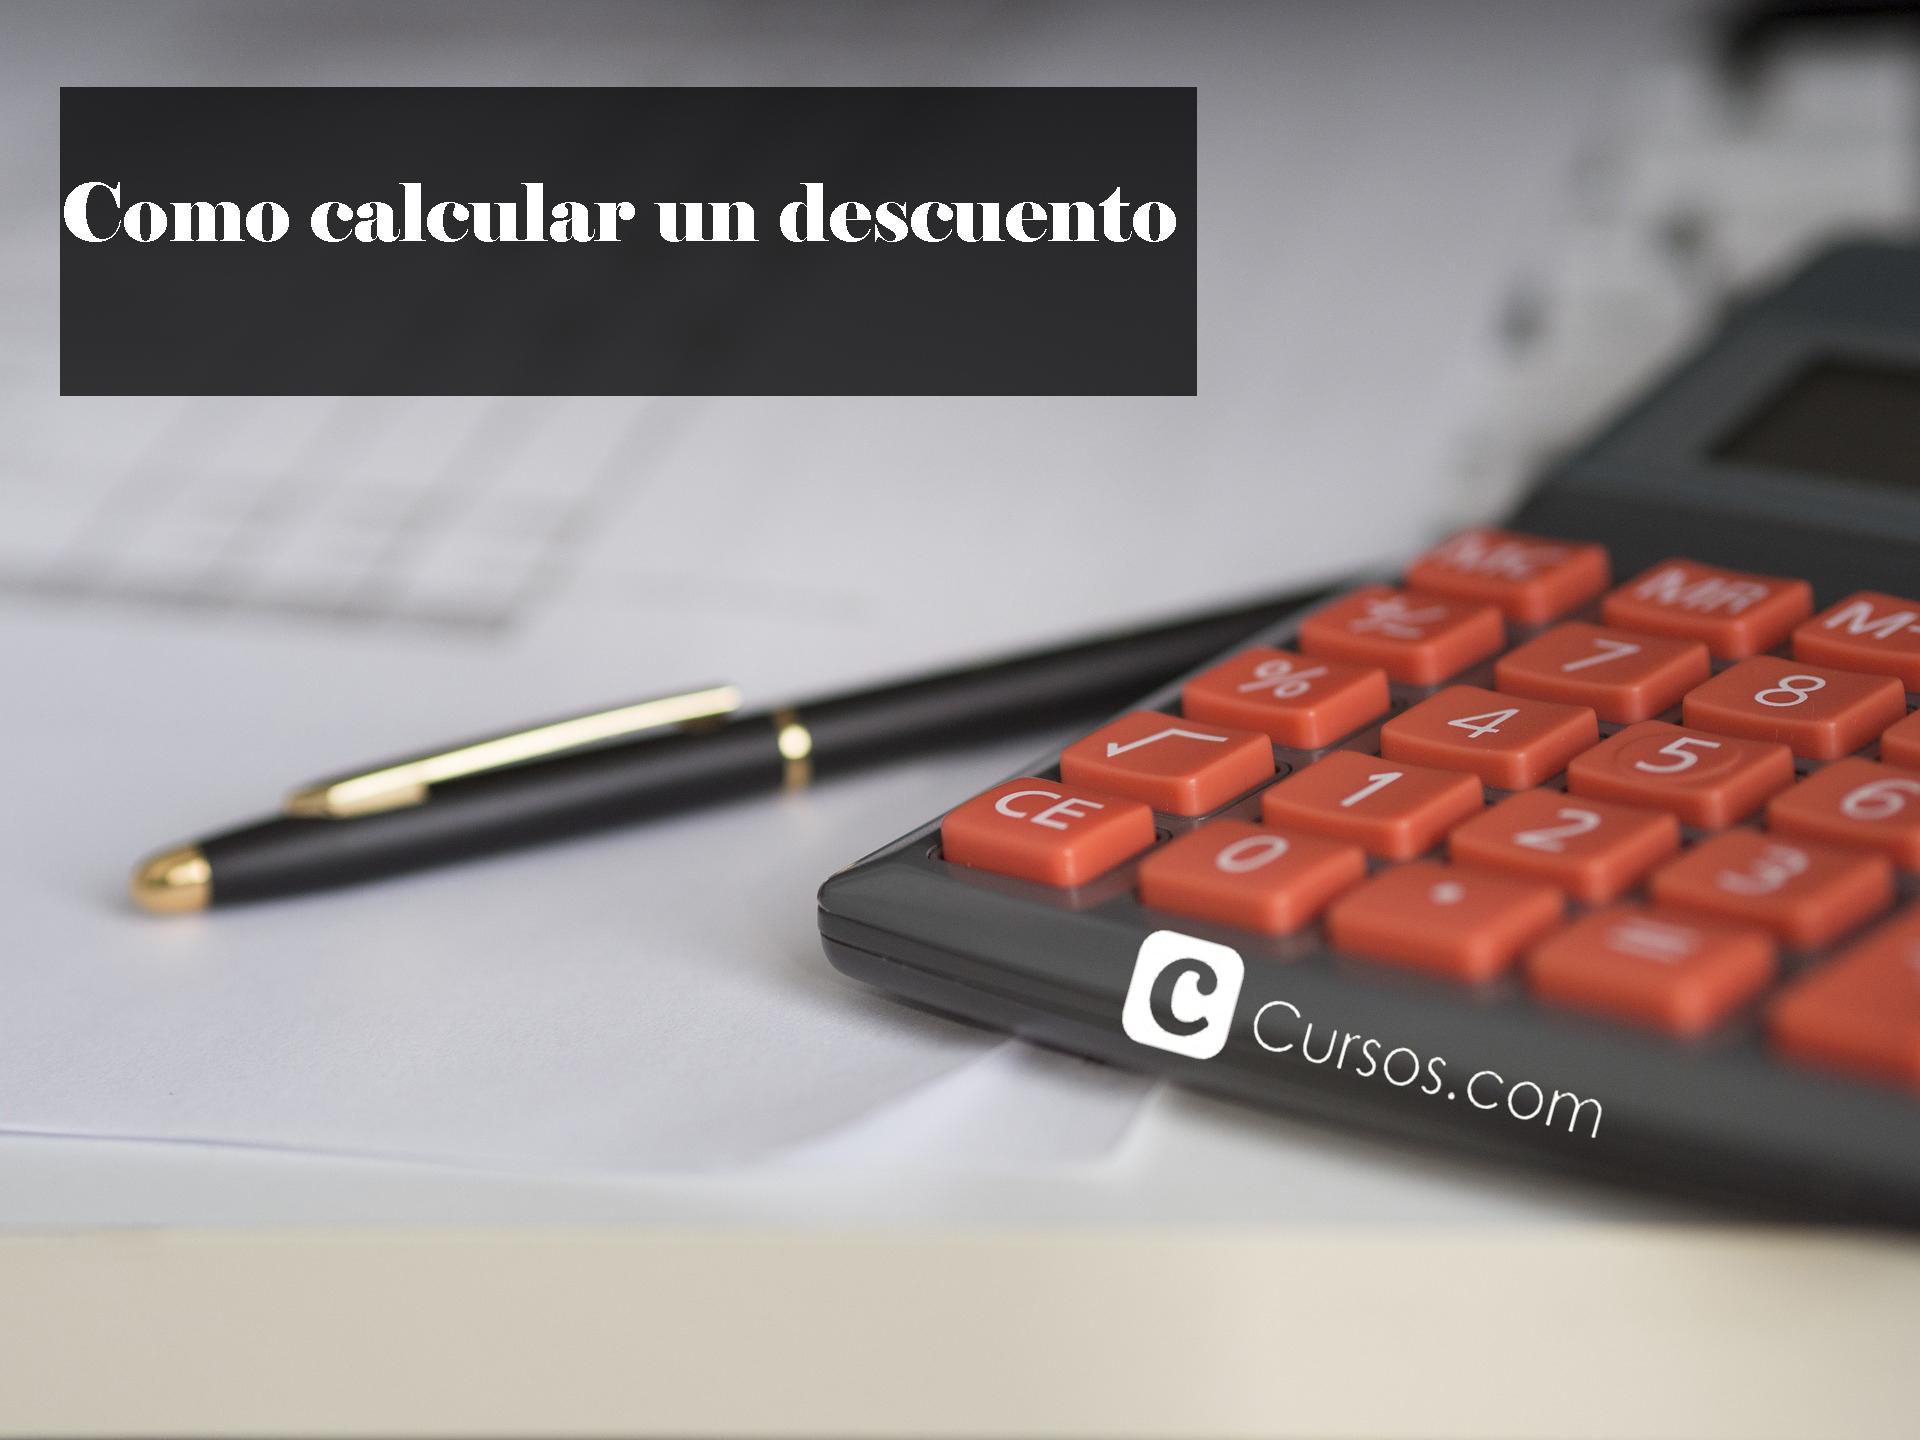 15a5fa3f4fb5 Como calcular un descuento